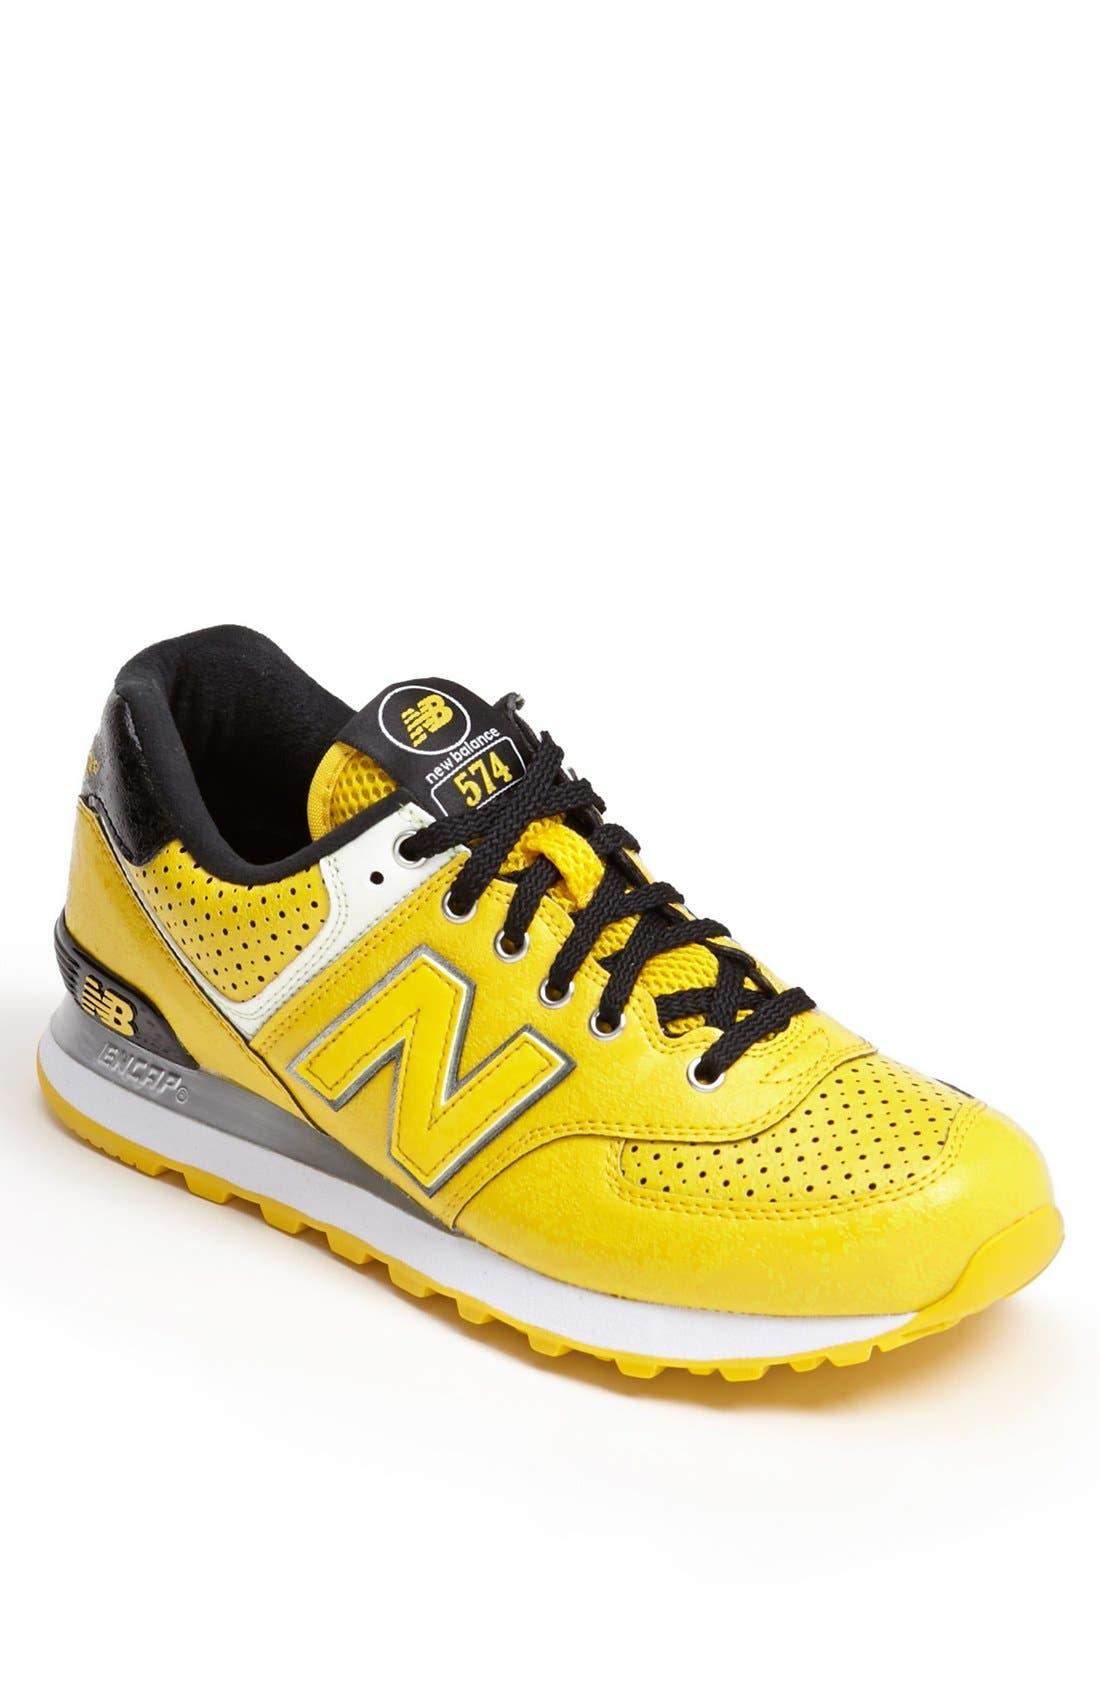 Alternate Image 1 Selected - New Balance '574 Alpha Moon' Sneaker (Men)